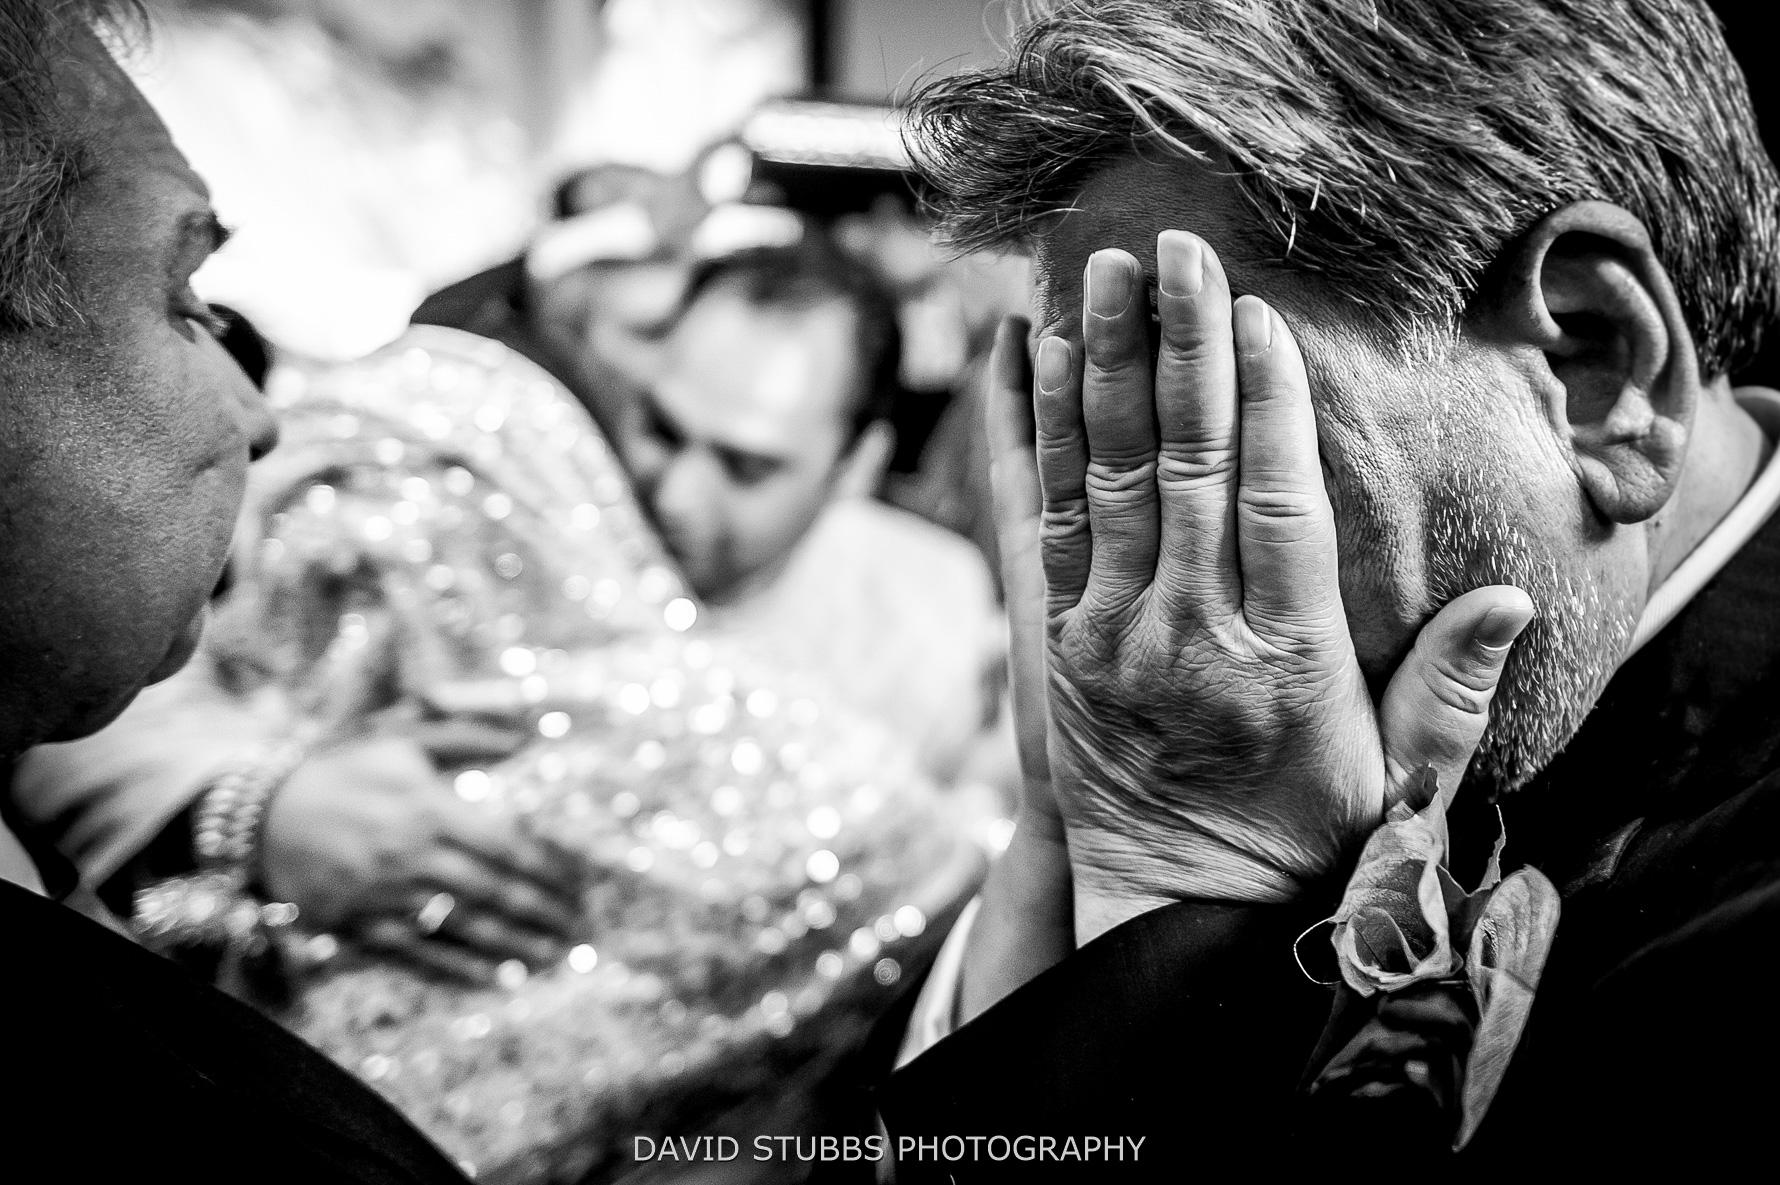 David-Stubbs-Photography-3